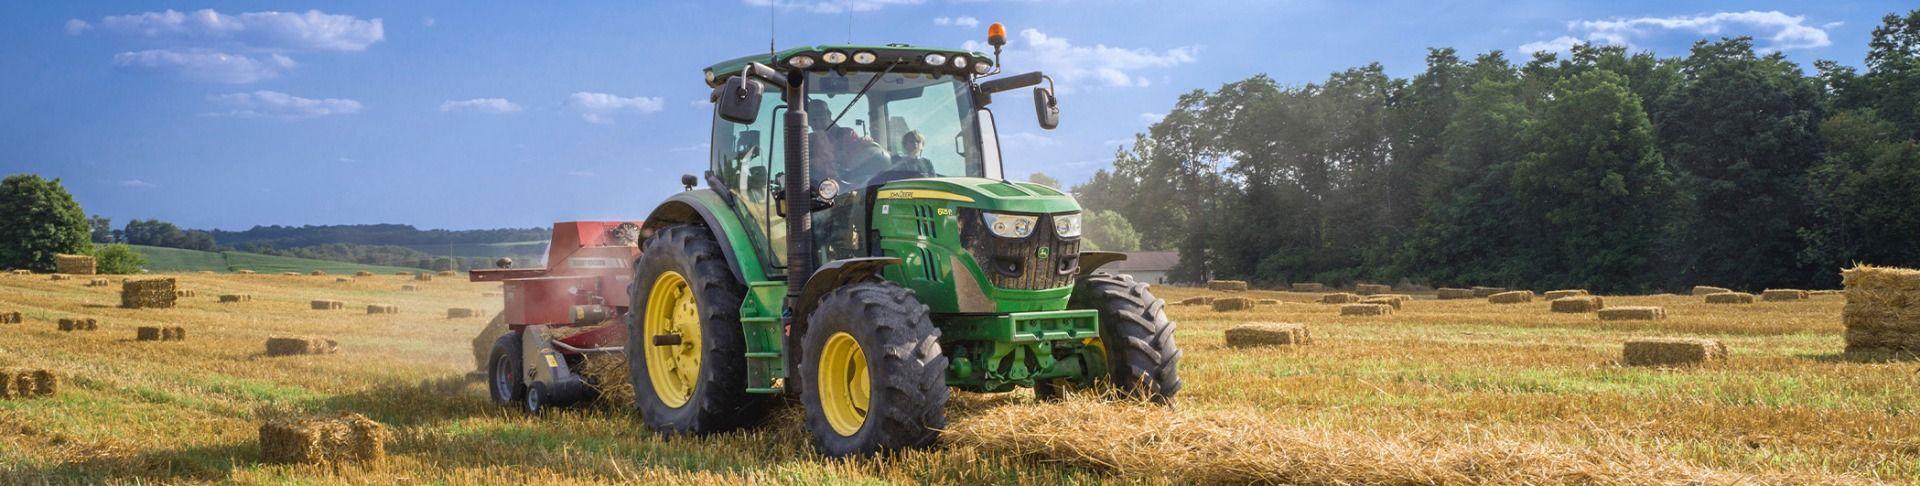 /infos/infos-traktorenpruefung-landmaschinenpruefung-baumaschinenpruefung